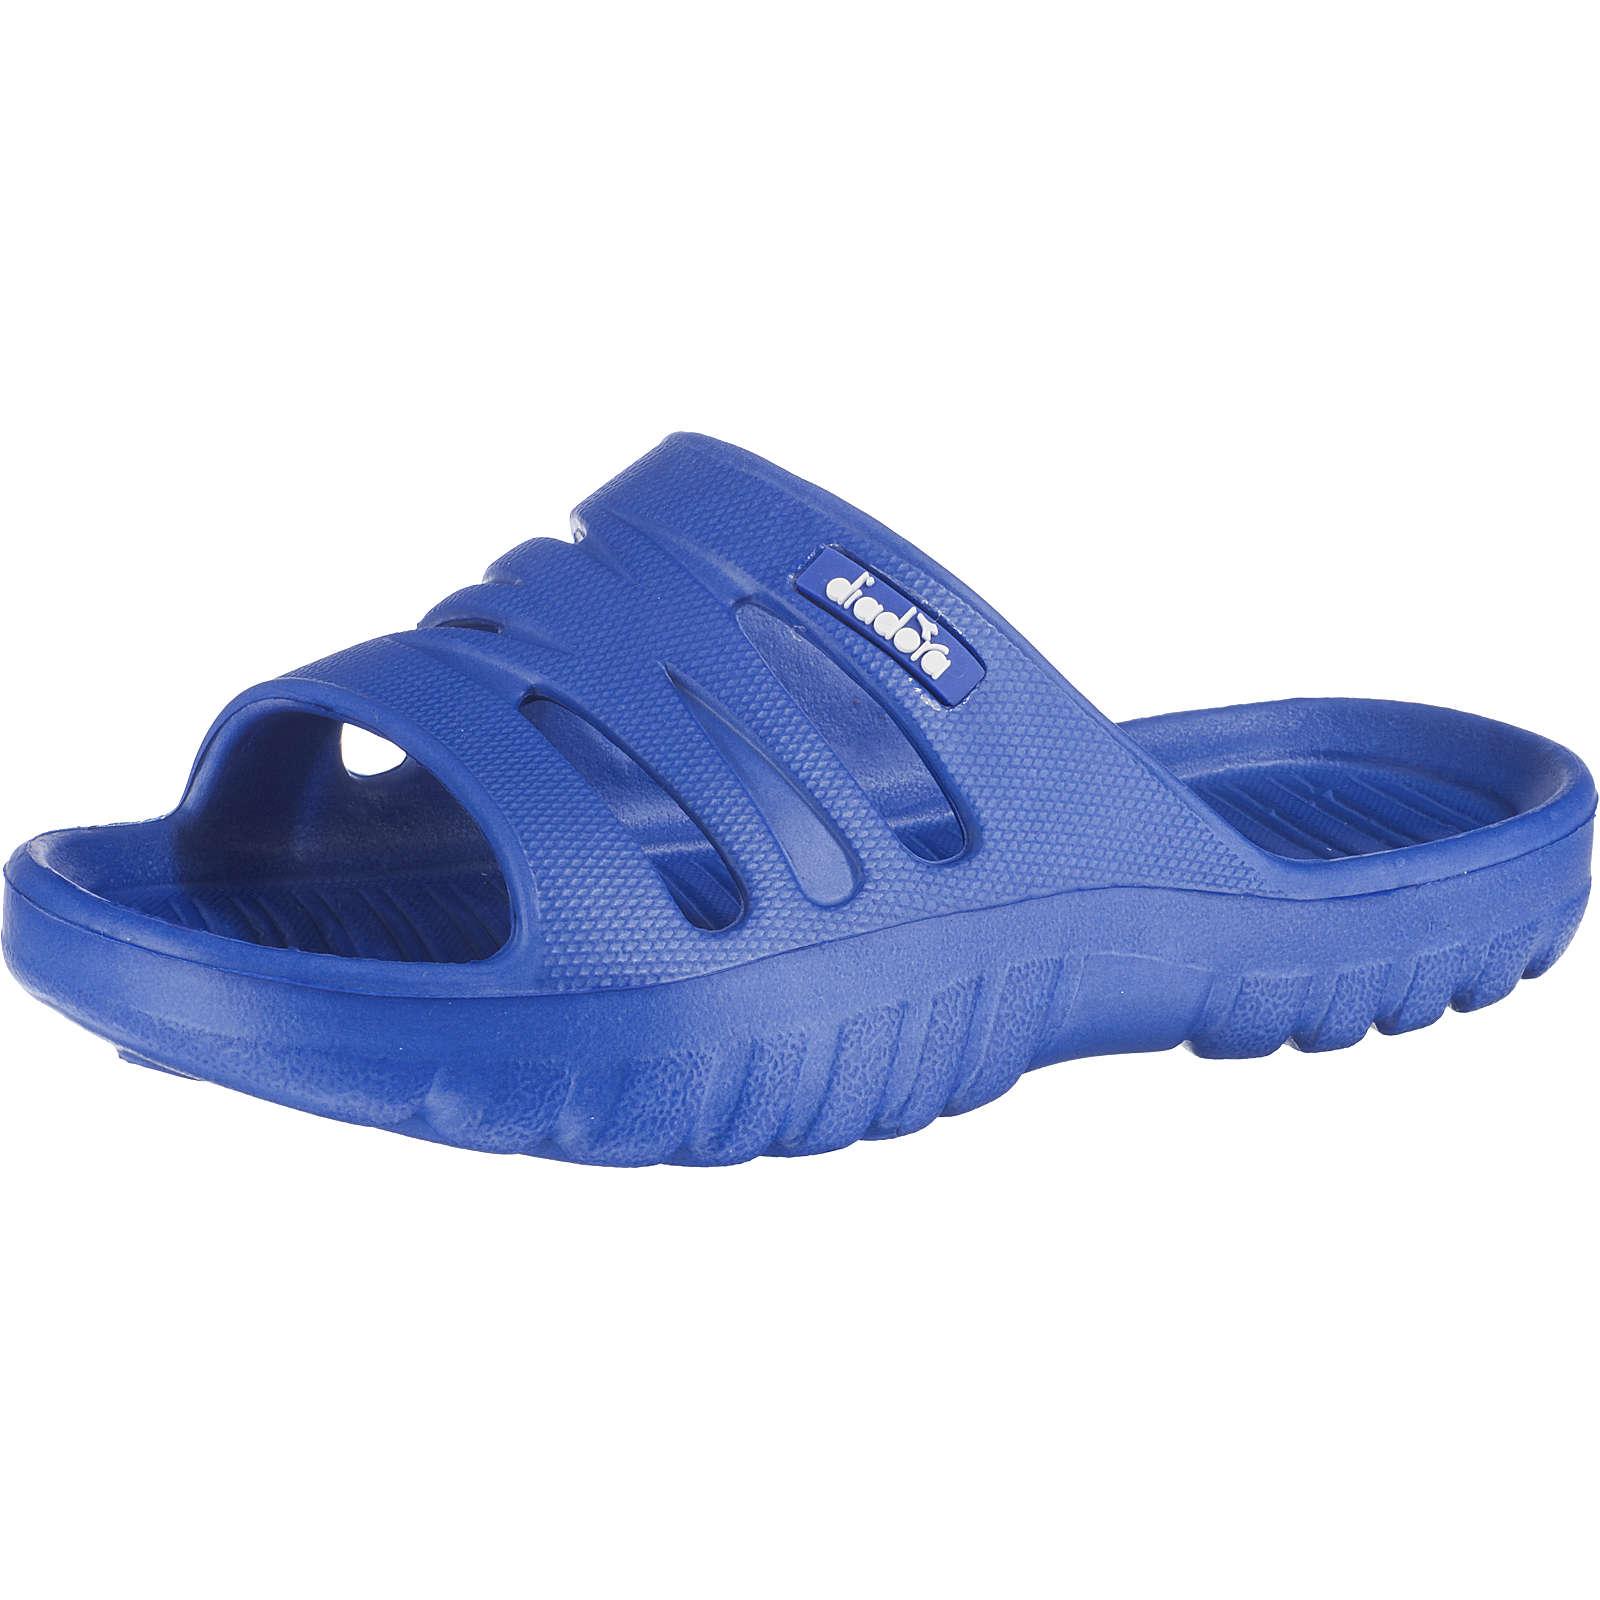 Diadora Kinder Badelatschen AGADIR JR blau Gr. 34